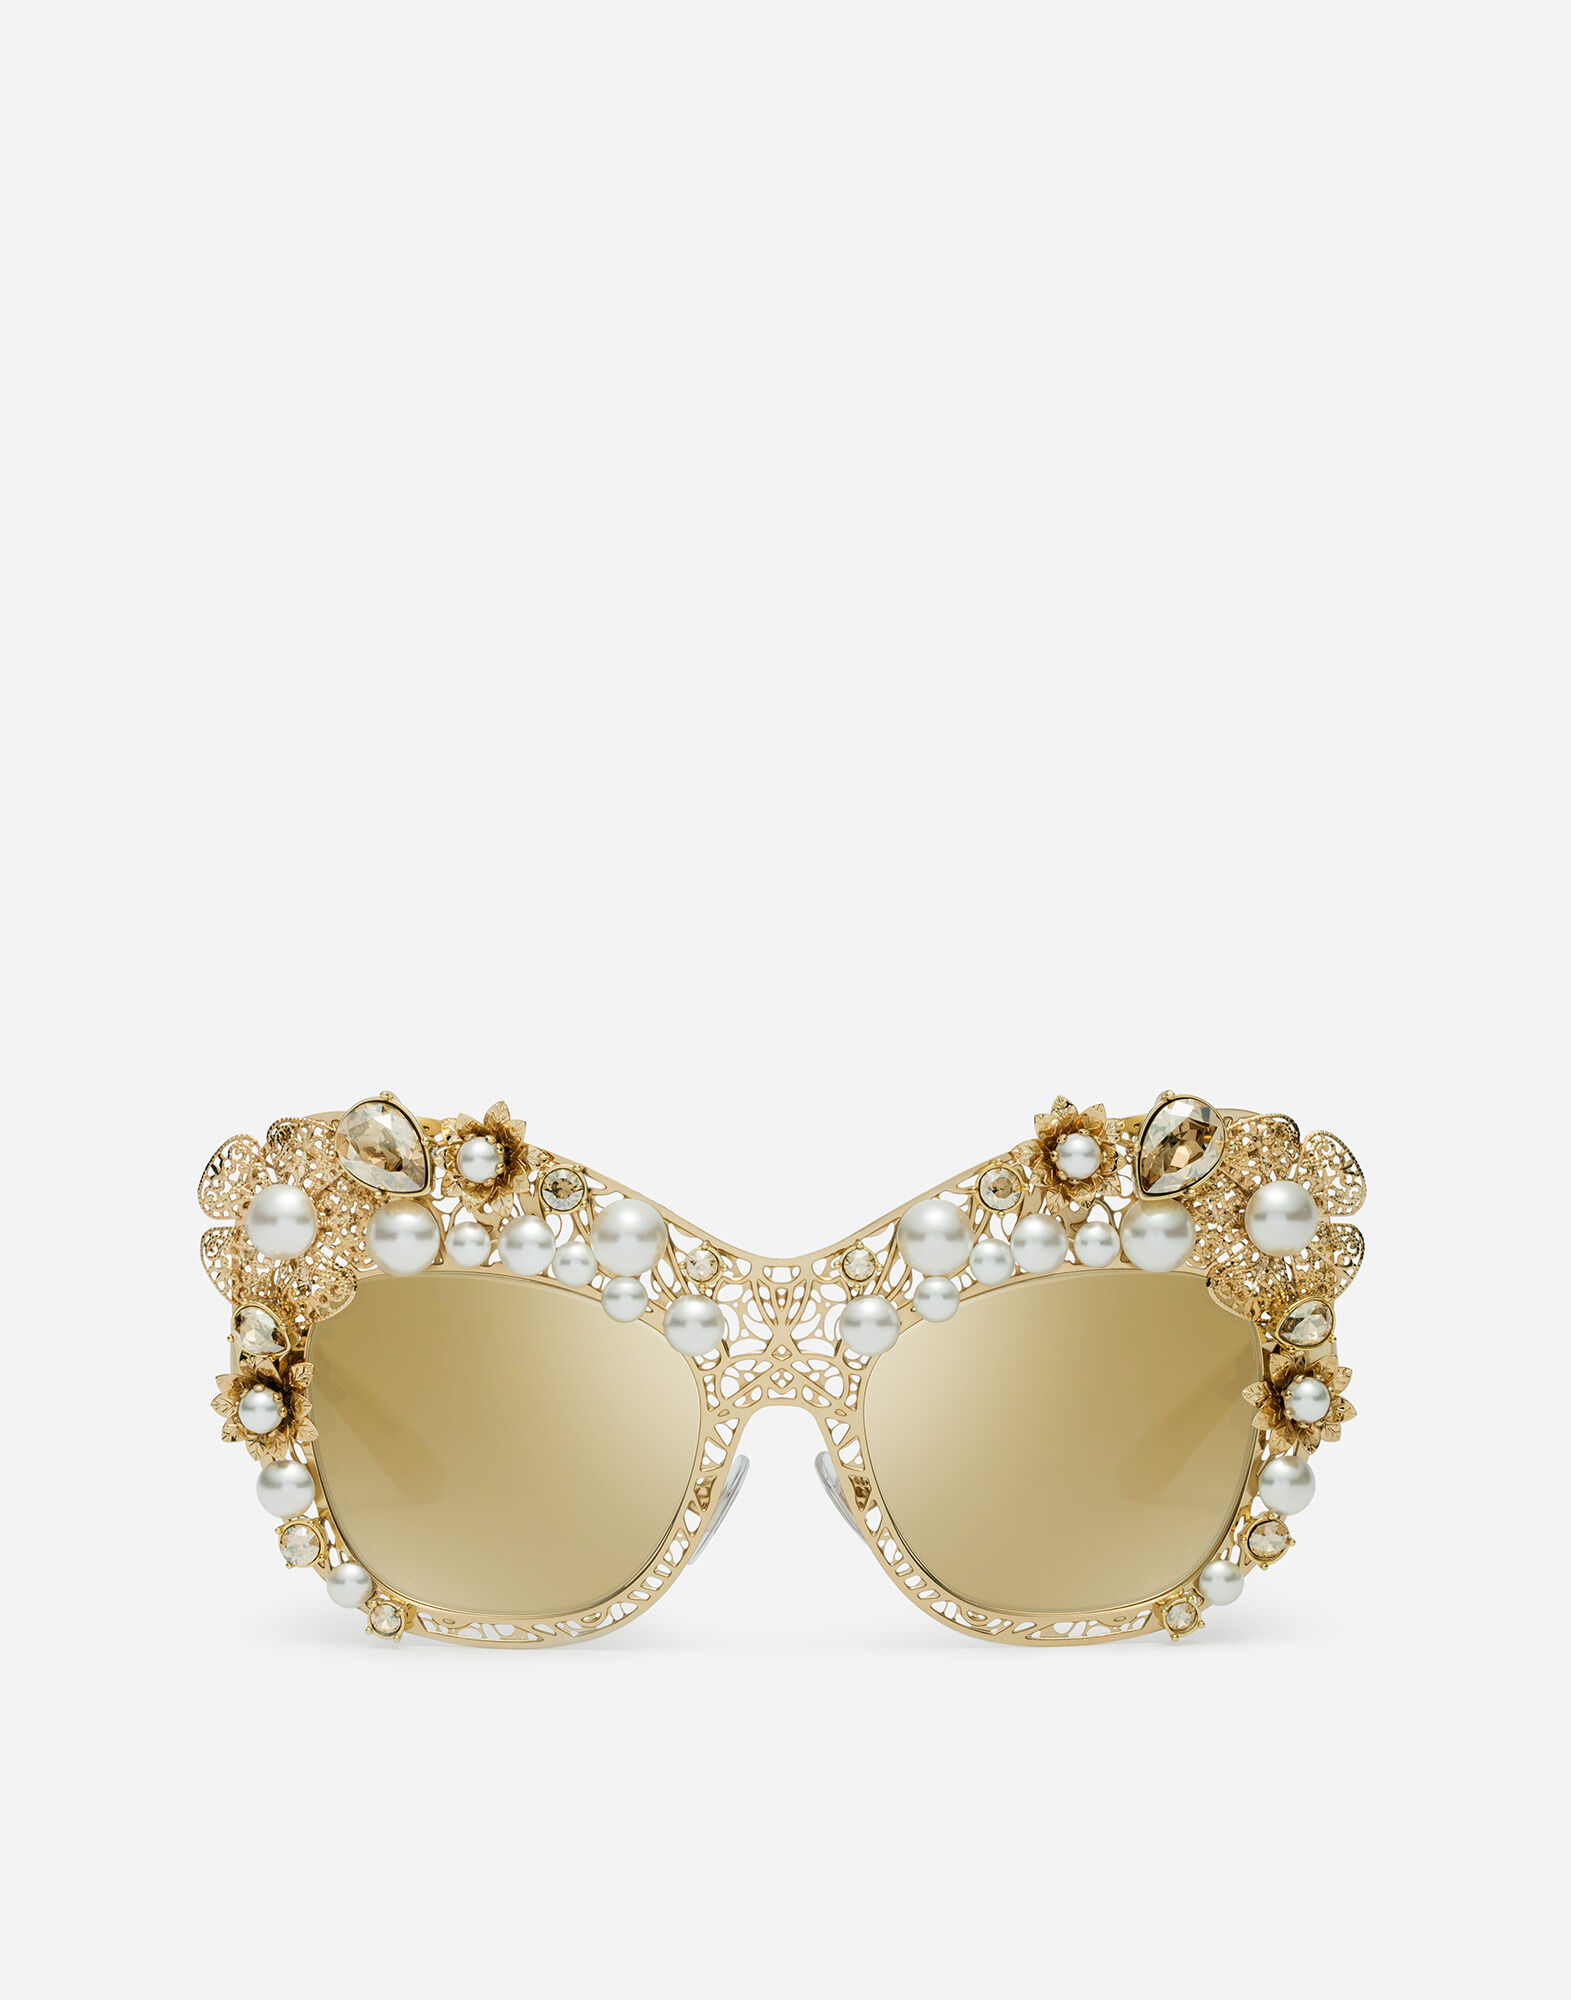 Femme Papillon Gabbana Dolce Lunette Claire Forme N0vwmn8O